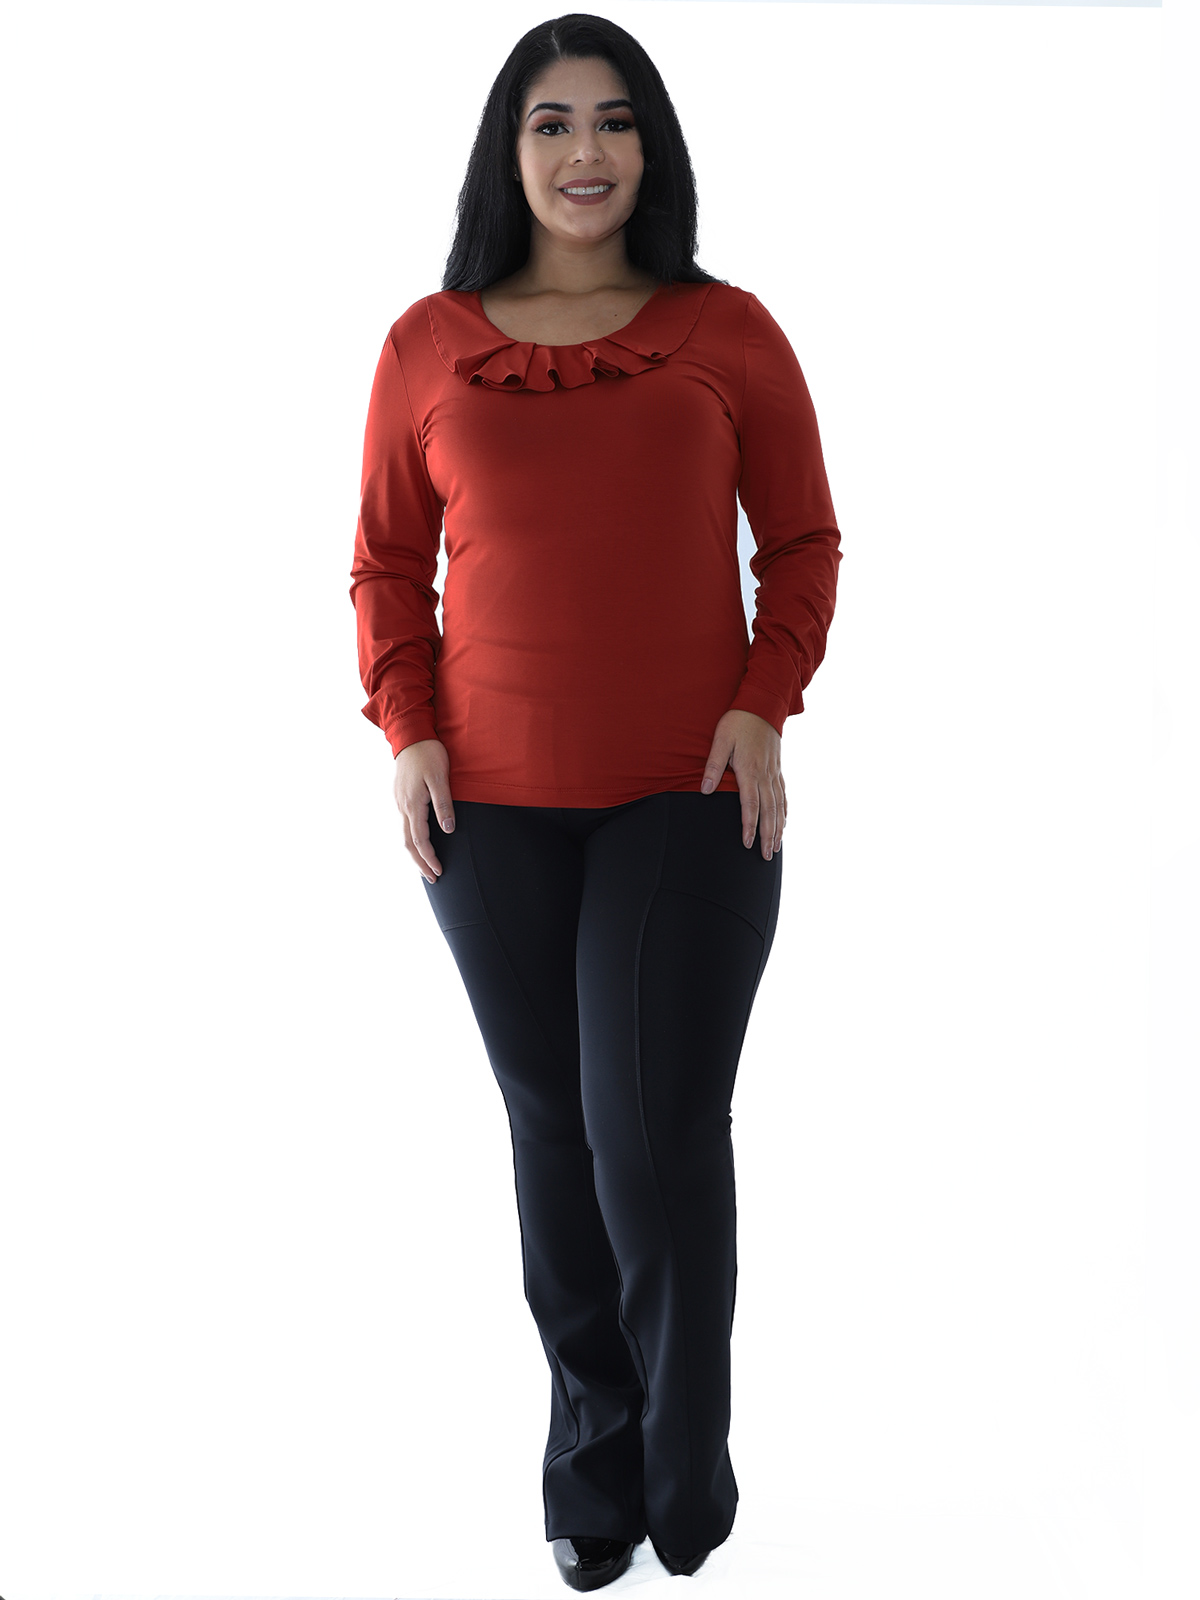 Blusa Plus Size Feminina Manga Longa Decote Redondo Tijolo